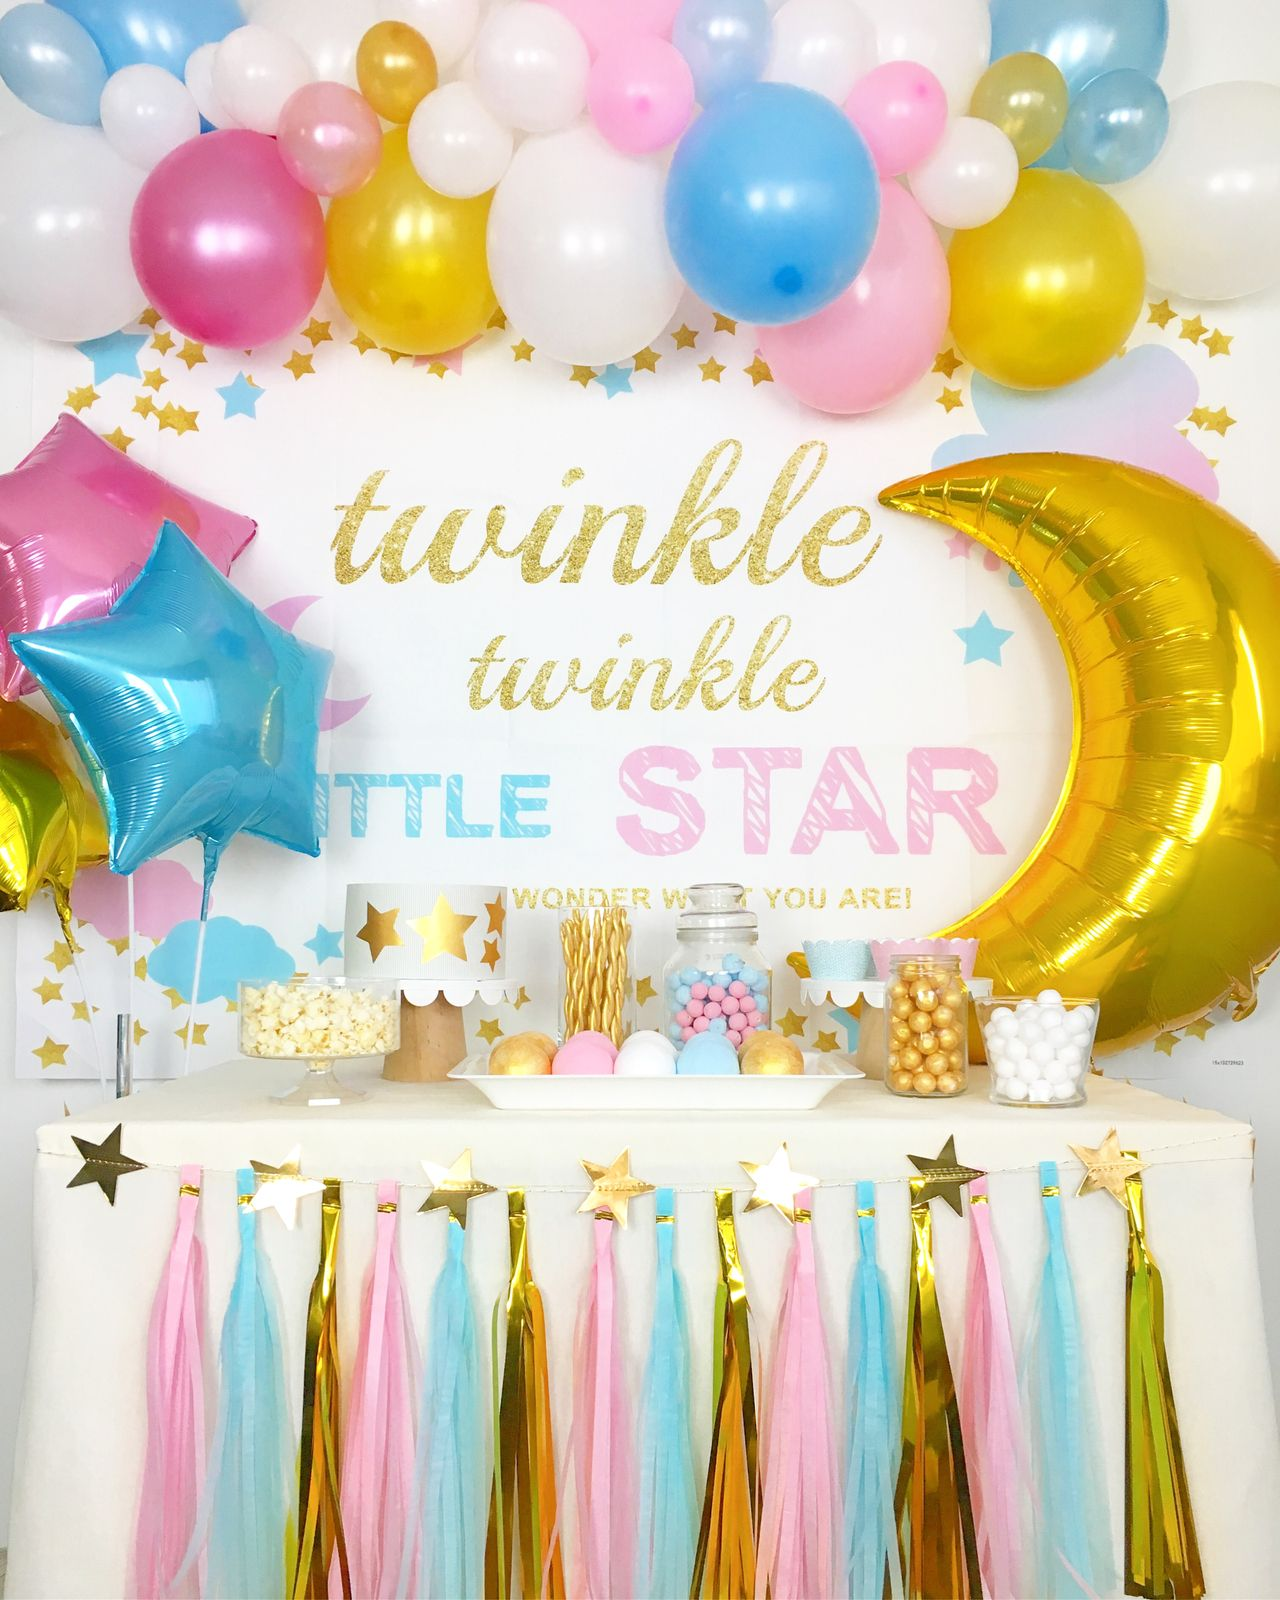 Twinkle Twinkle Little Star Gender Reveal Baby Shower Party Deco Gender Reveal Party Decorations Baby Gender Reveal Party Decorations Baby Gender Reveal Party